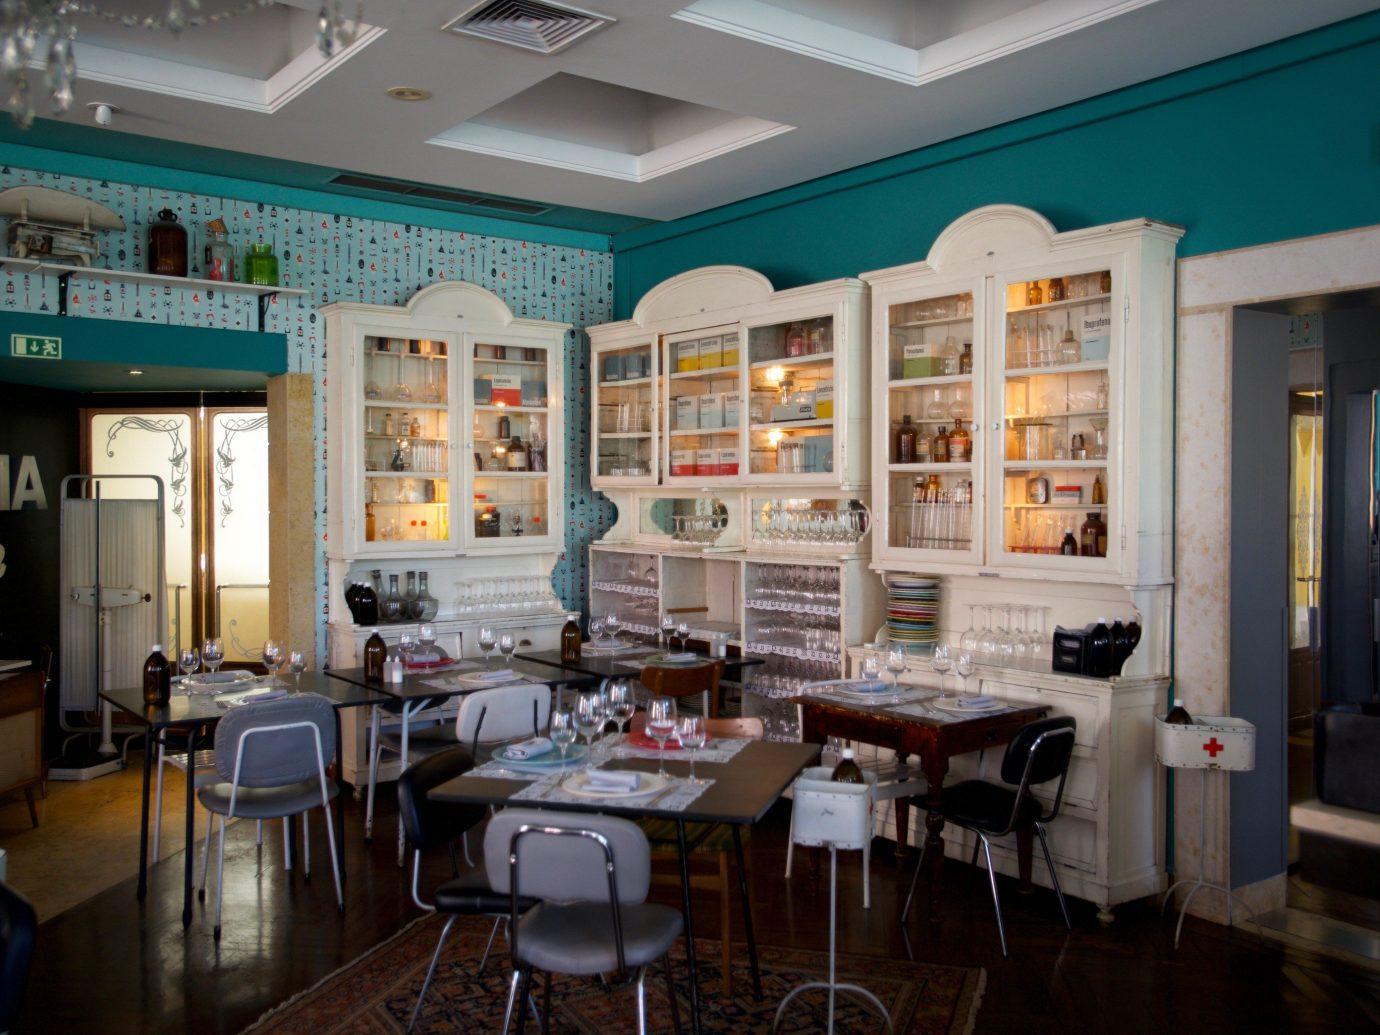 Trip Ideas indoor floor ceiling room restaurant interior design café Design furniture cluttered